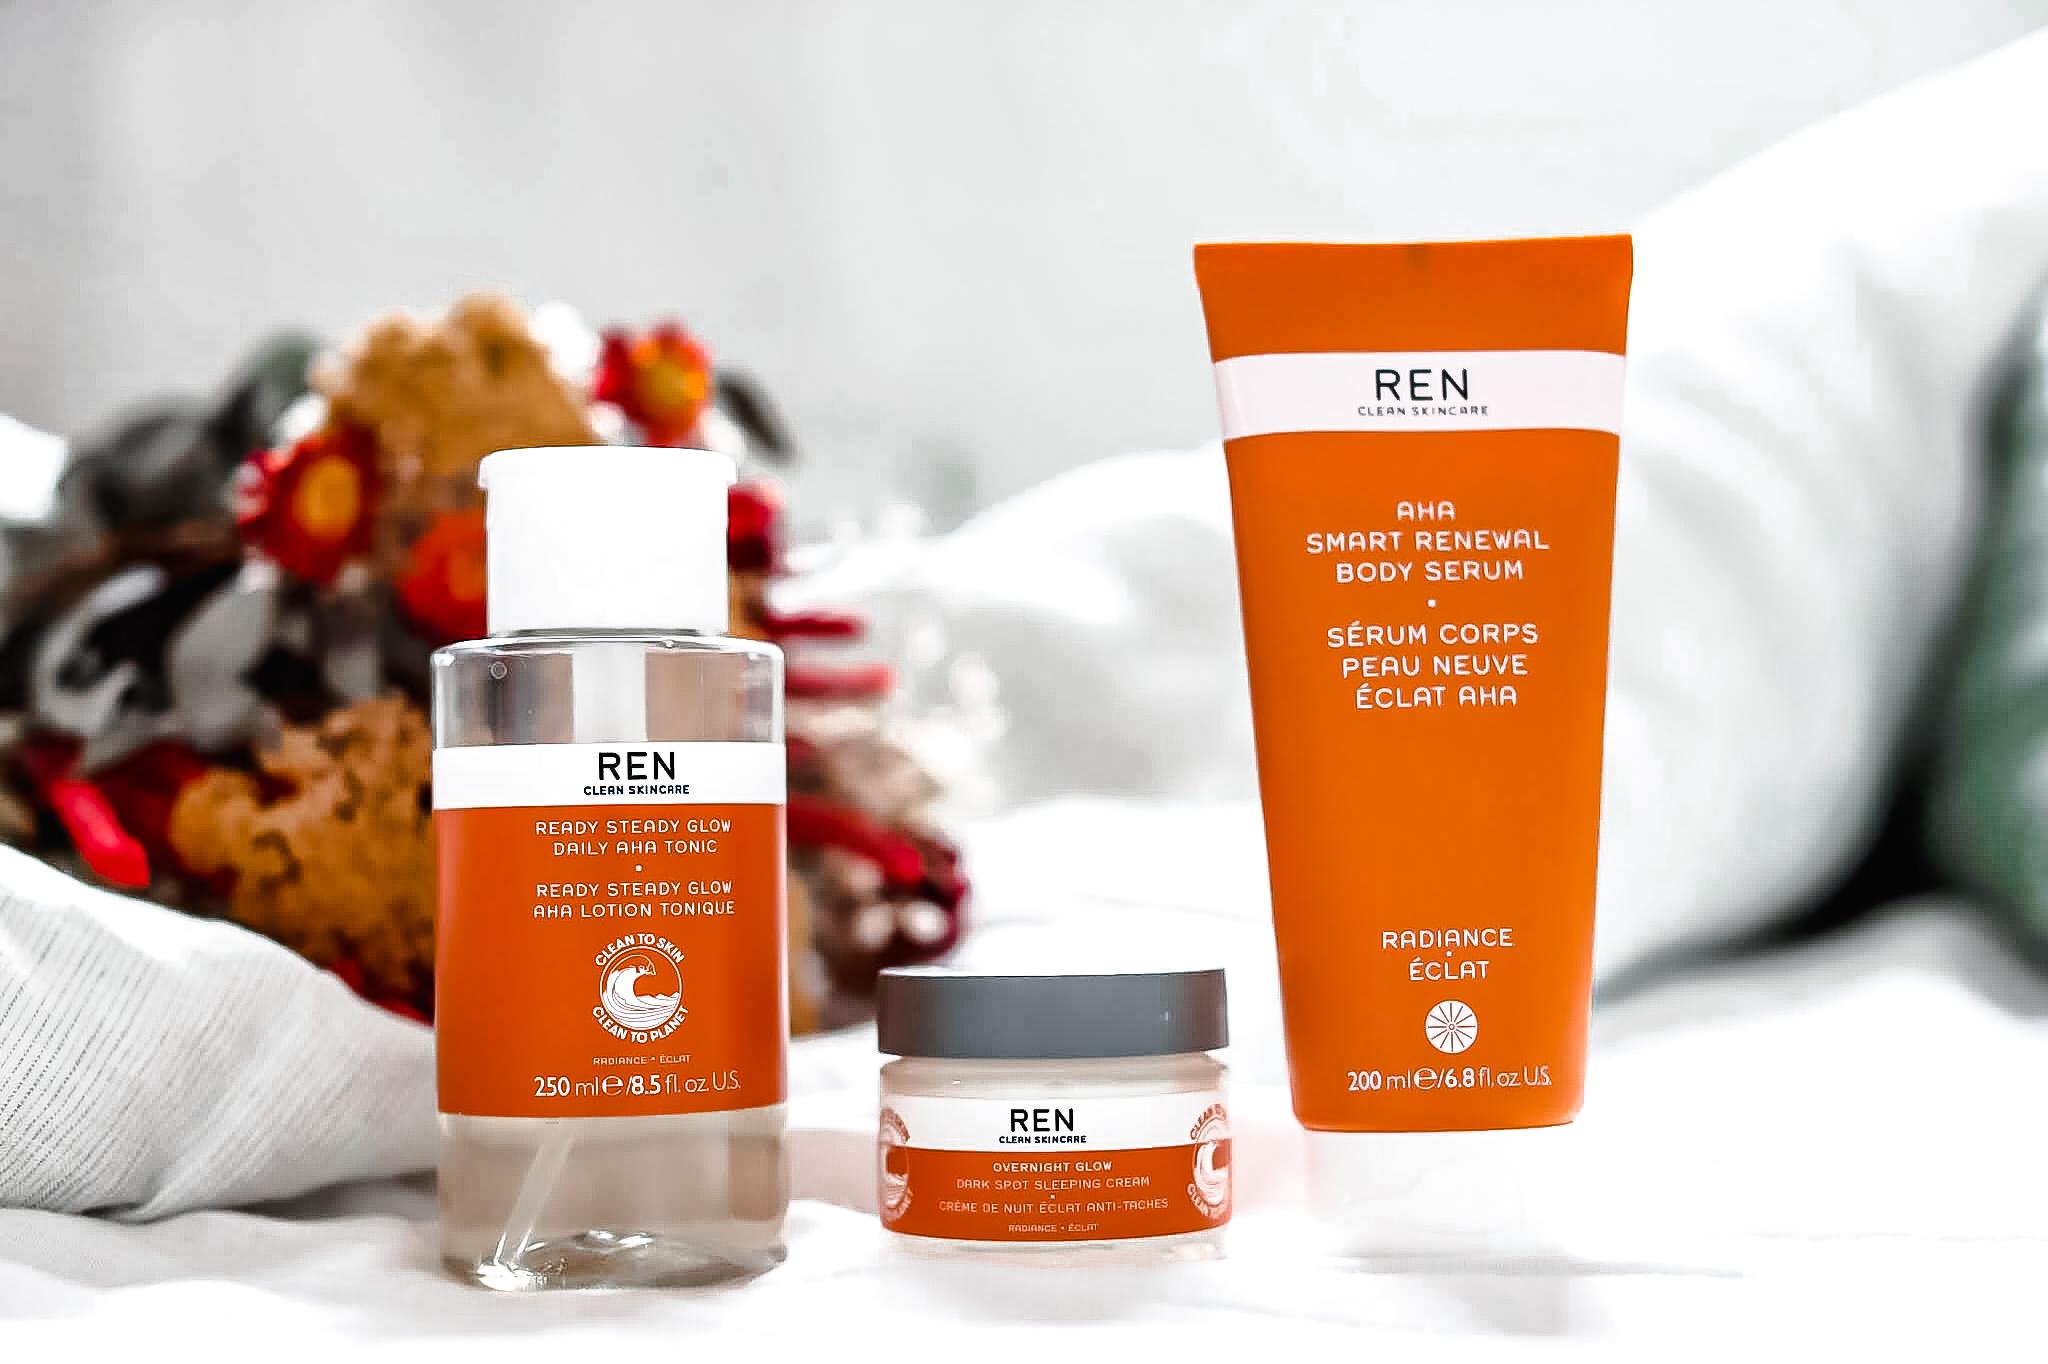 REN Skincare soins glow éclat